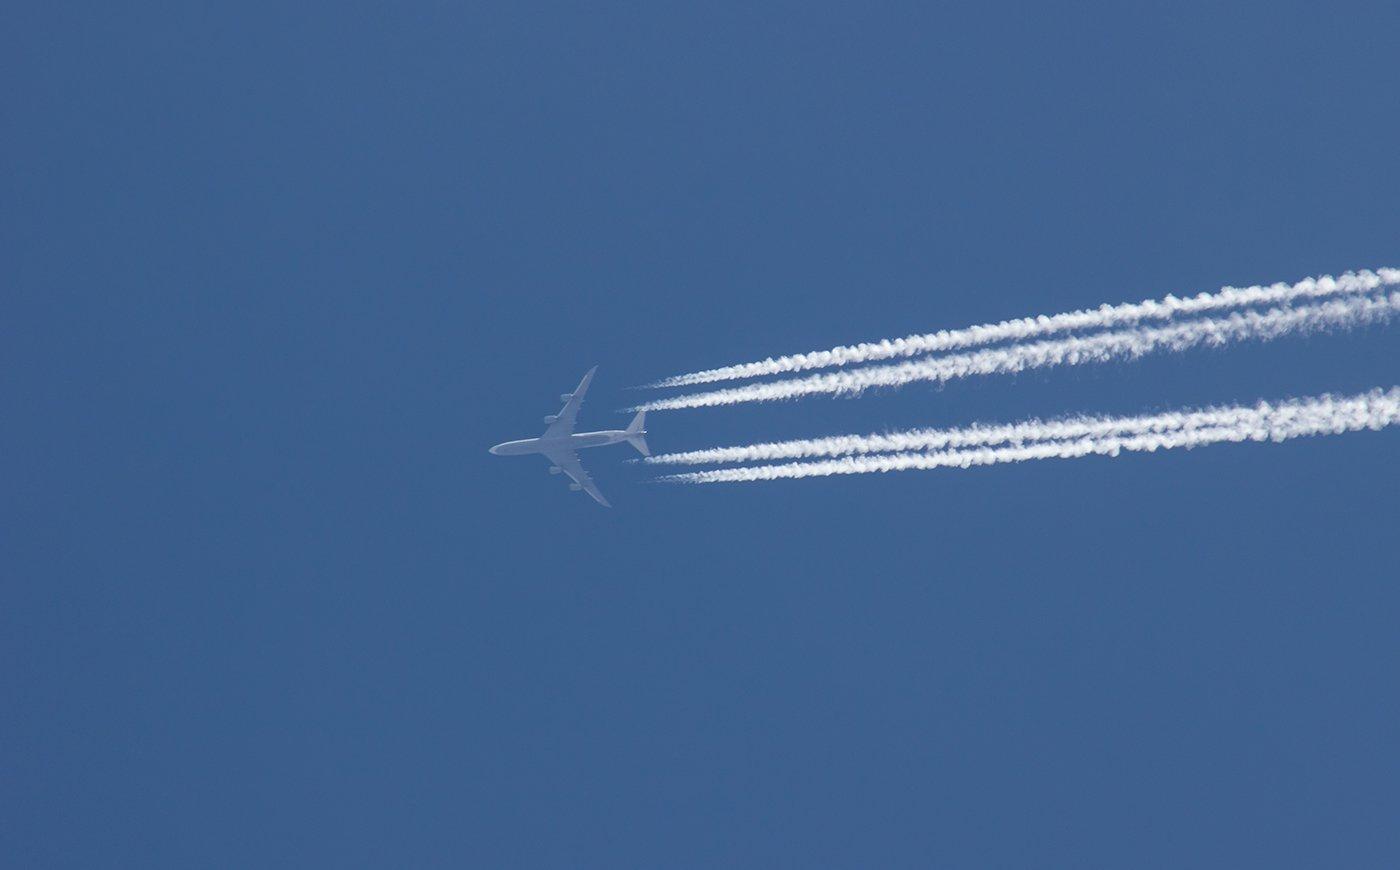 Boeing 747-8 авиакомпании Lufthansa в небе над Иркутском